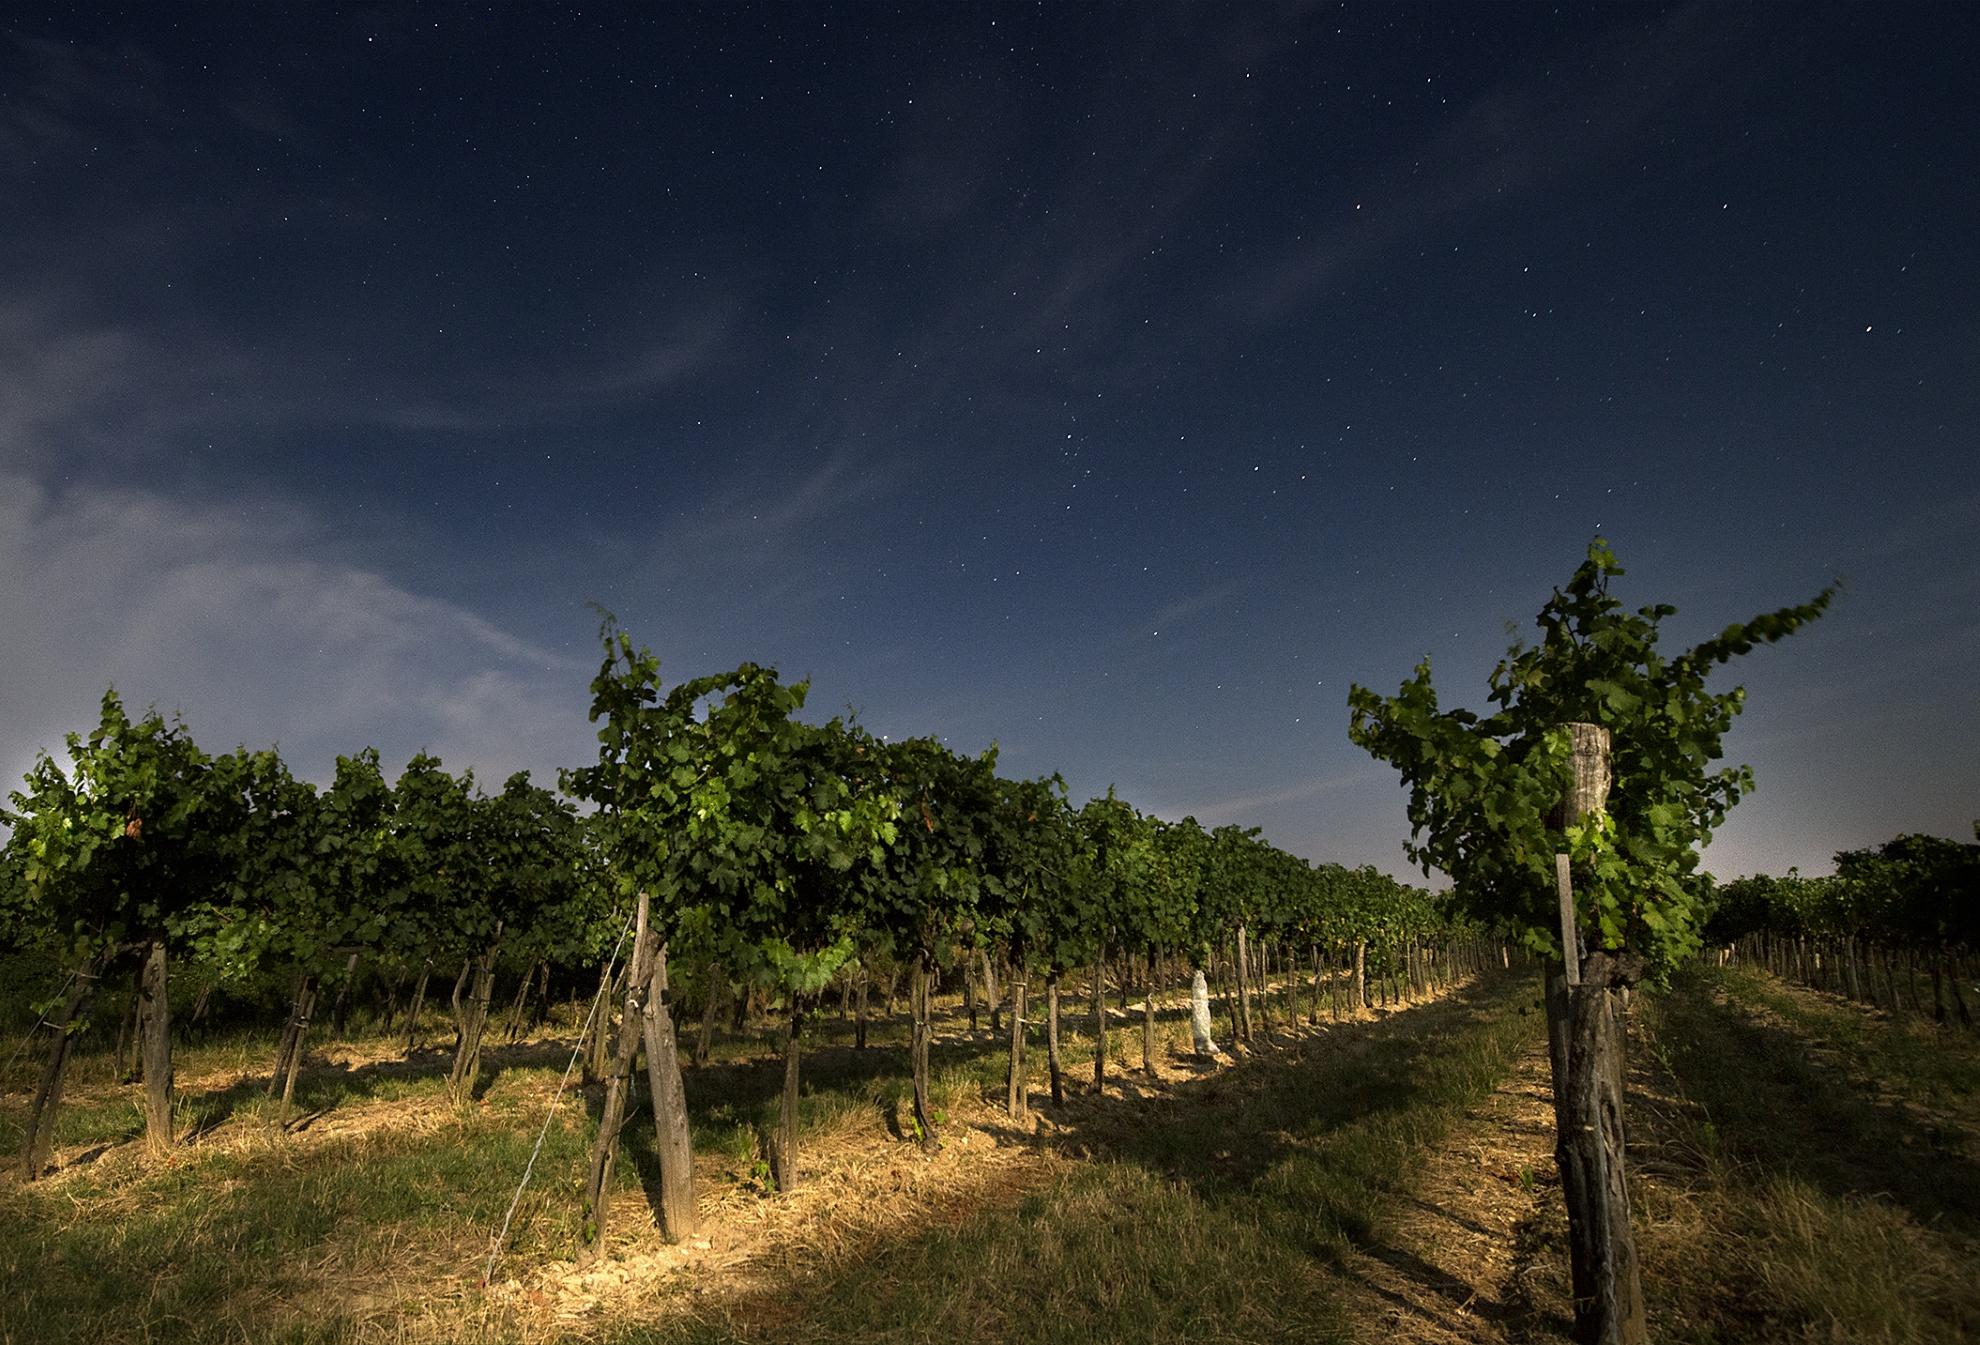 Vinifika-wijndomein-martin-diwald